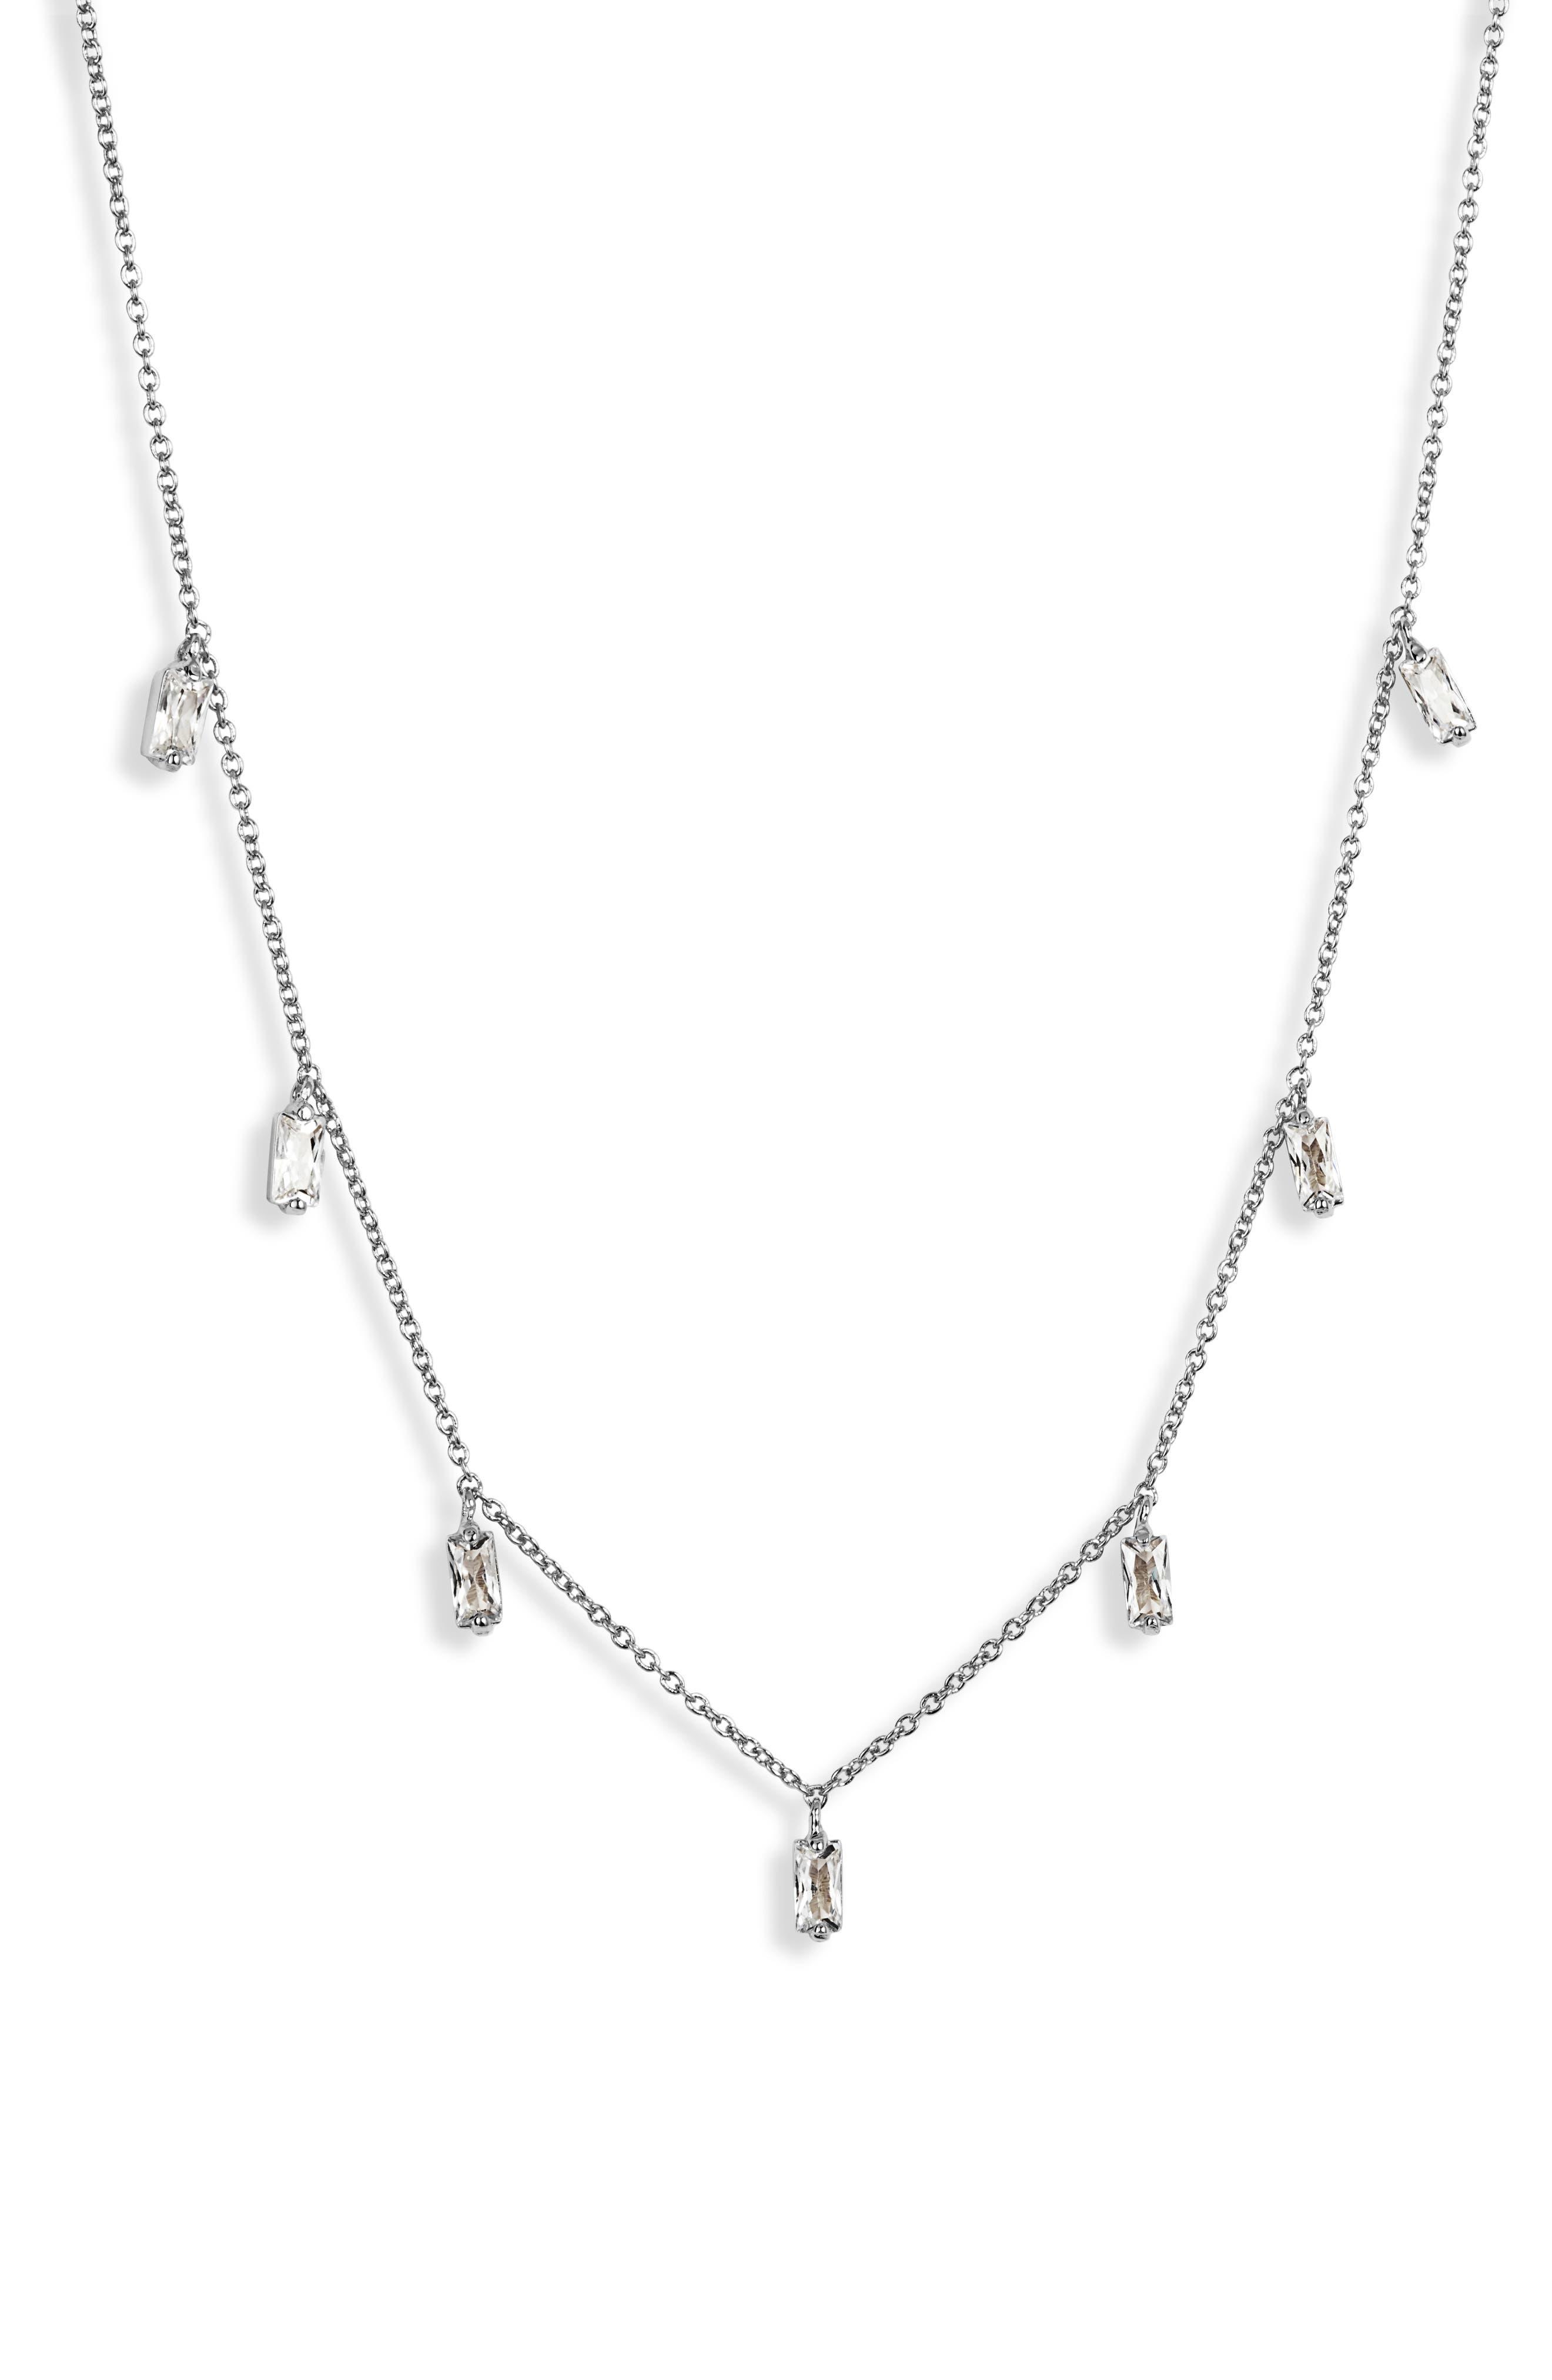 GORJANA, Amara Crystal Fringe Necklace, Main thumbnail 1, color, SILVER